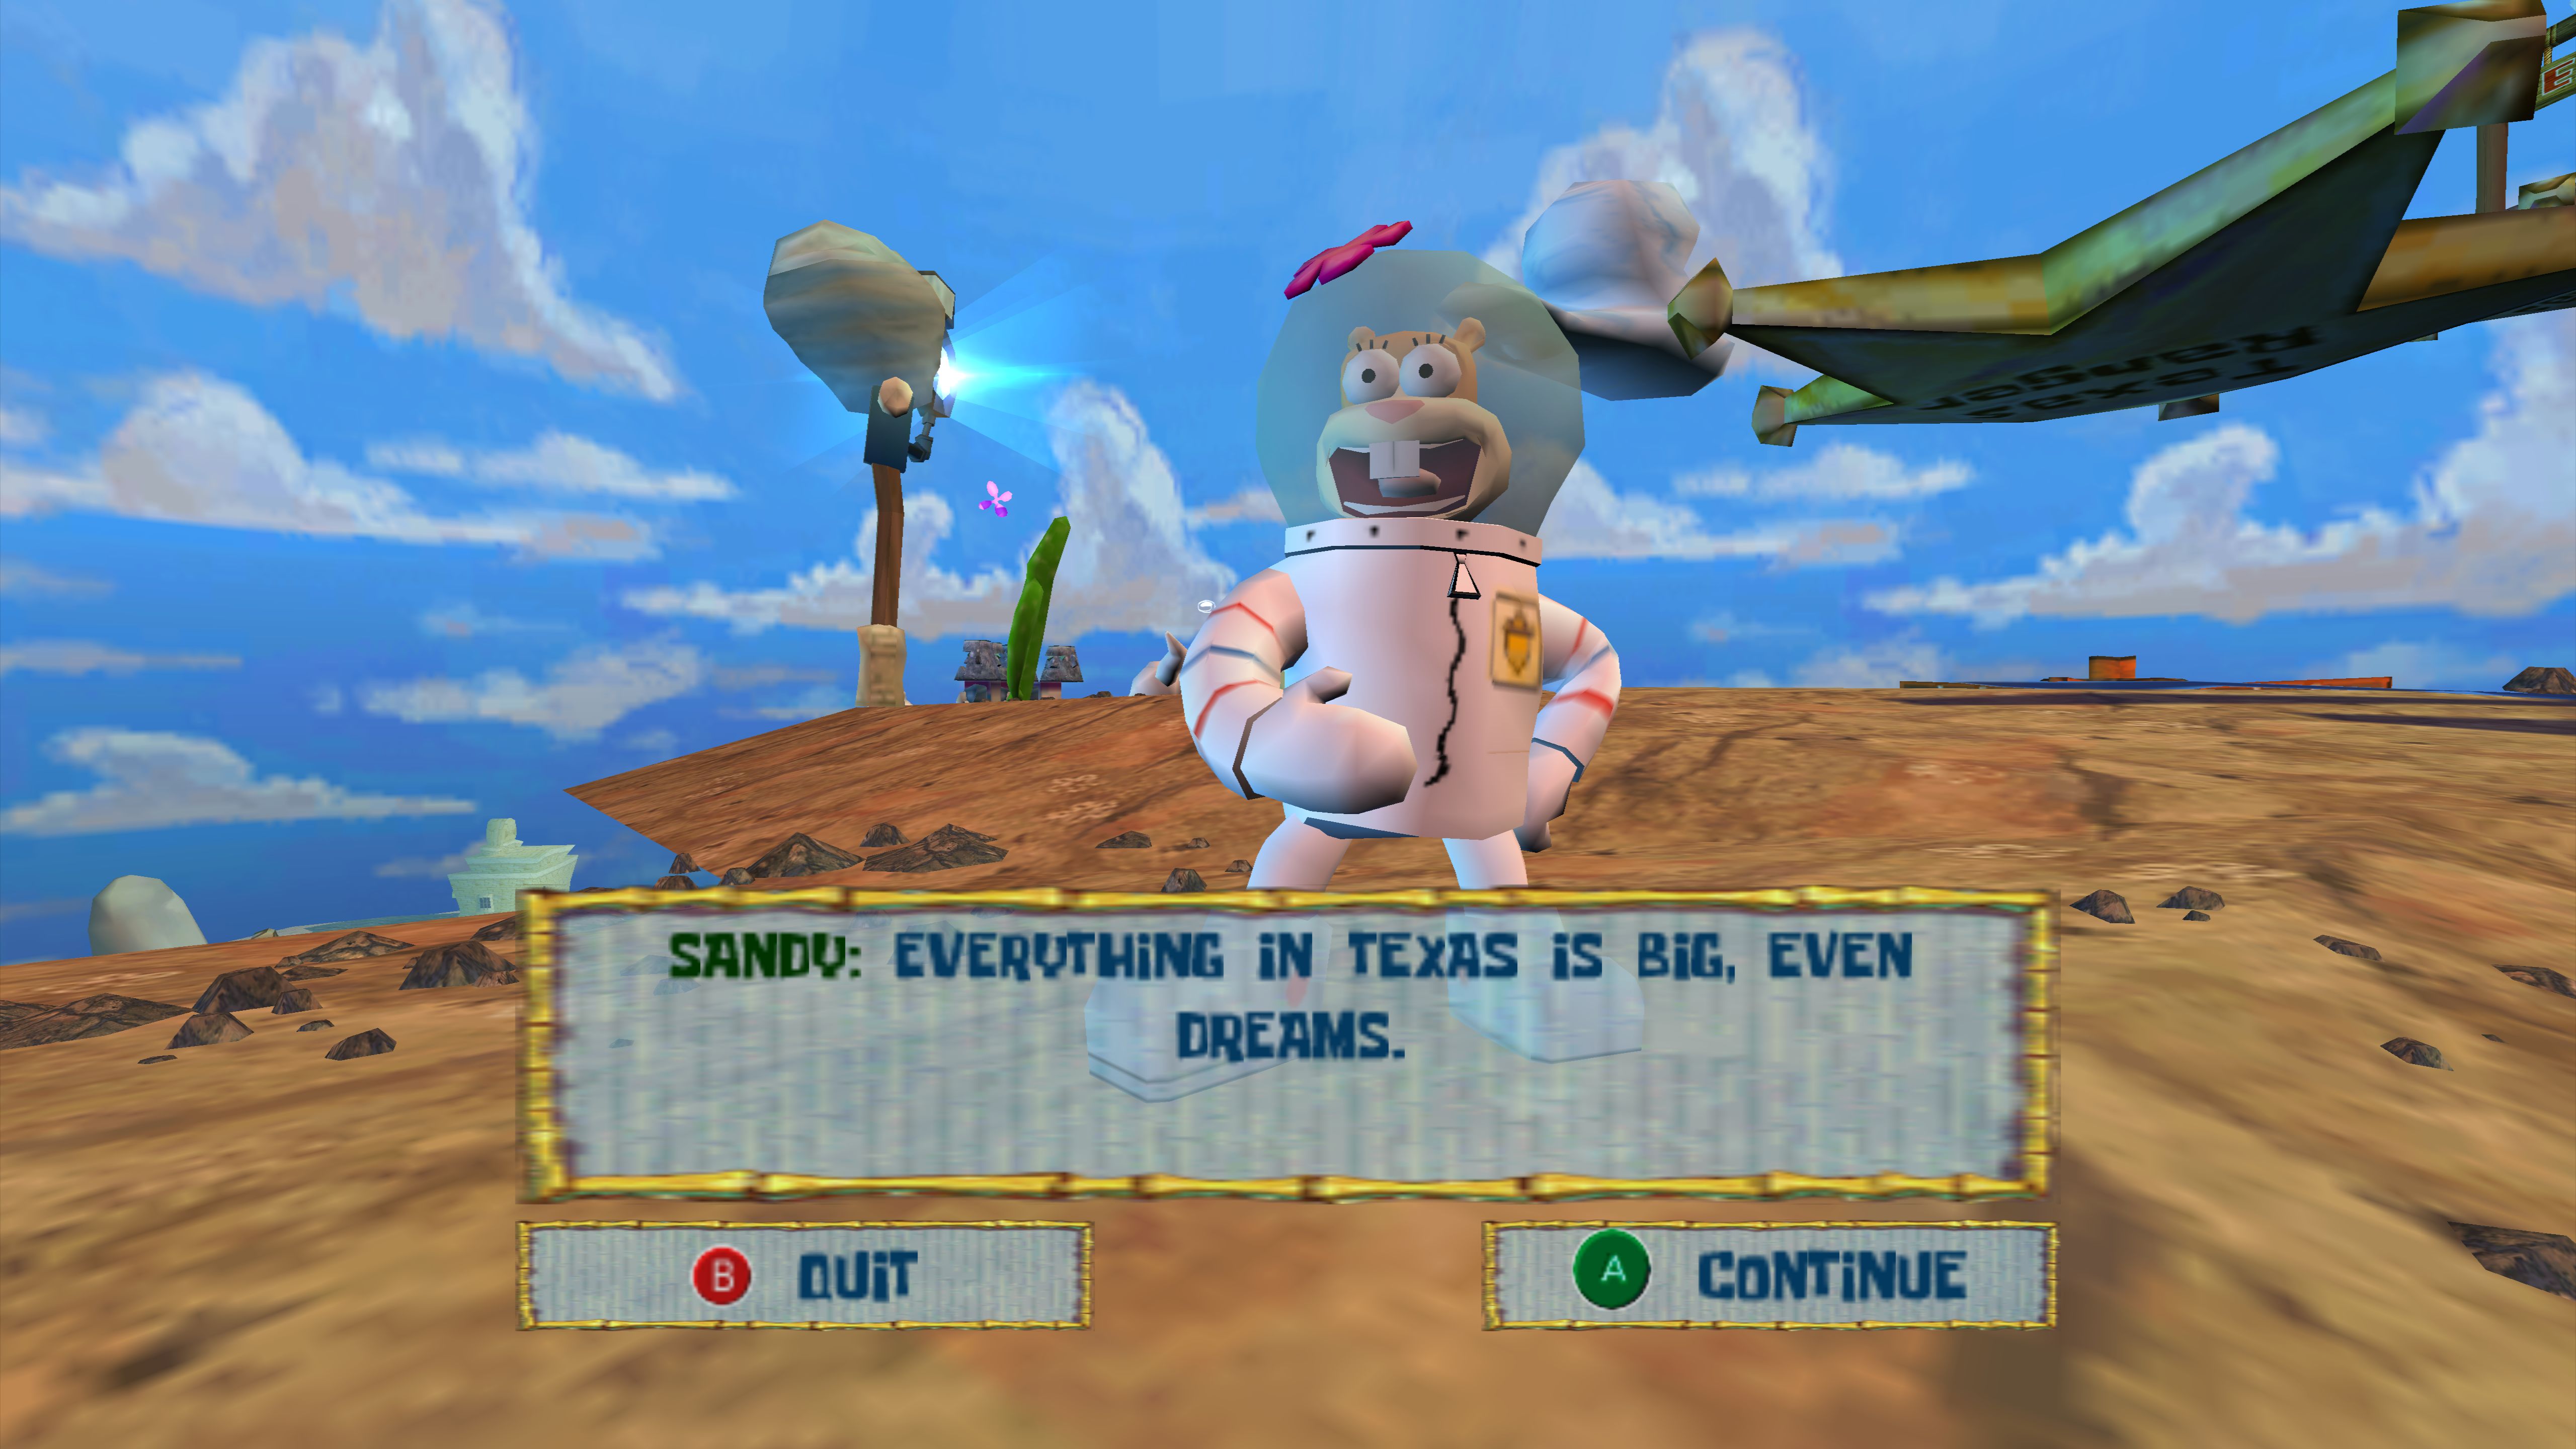 File:Battle For Bikini Bottom Sandy Dream 1.png